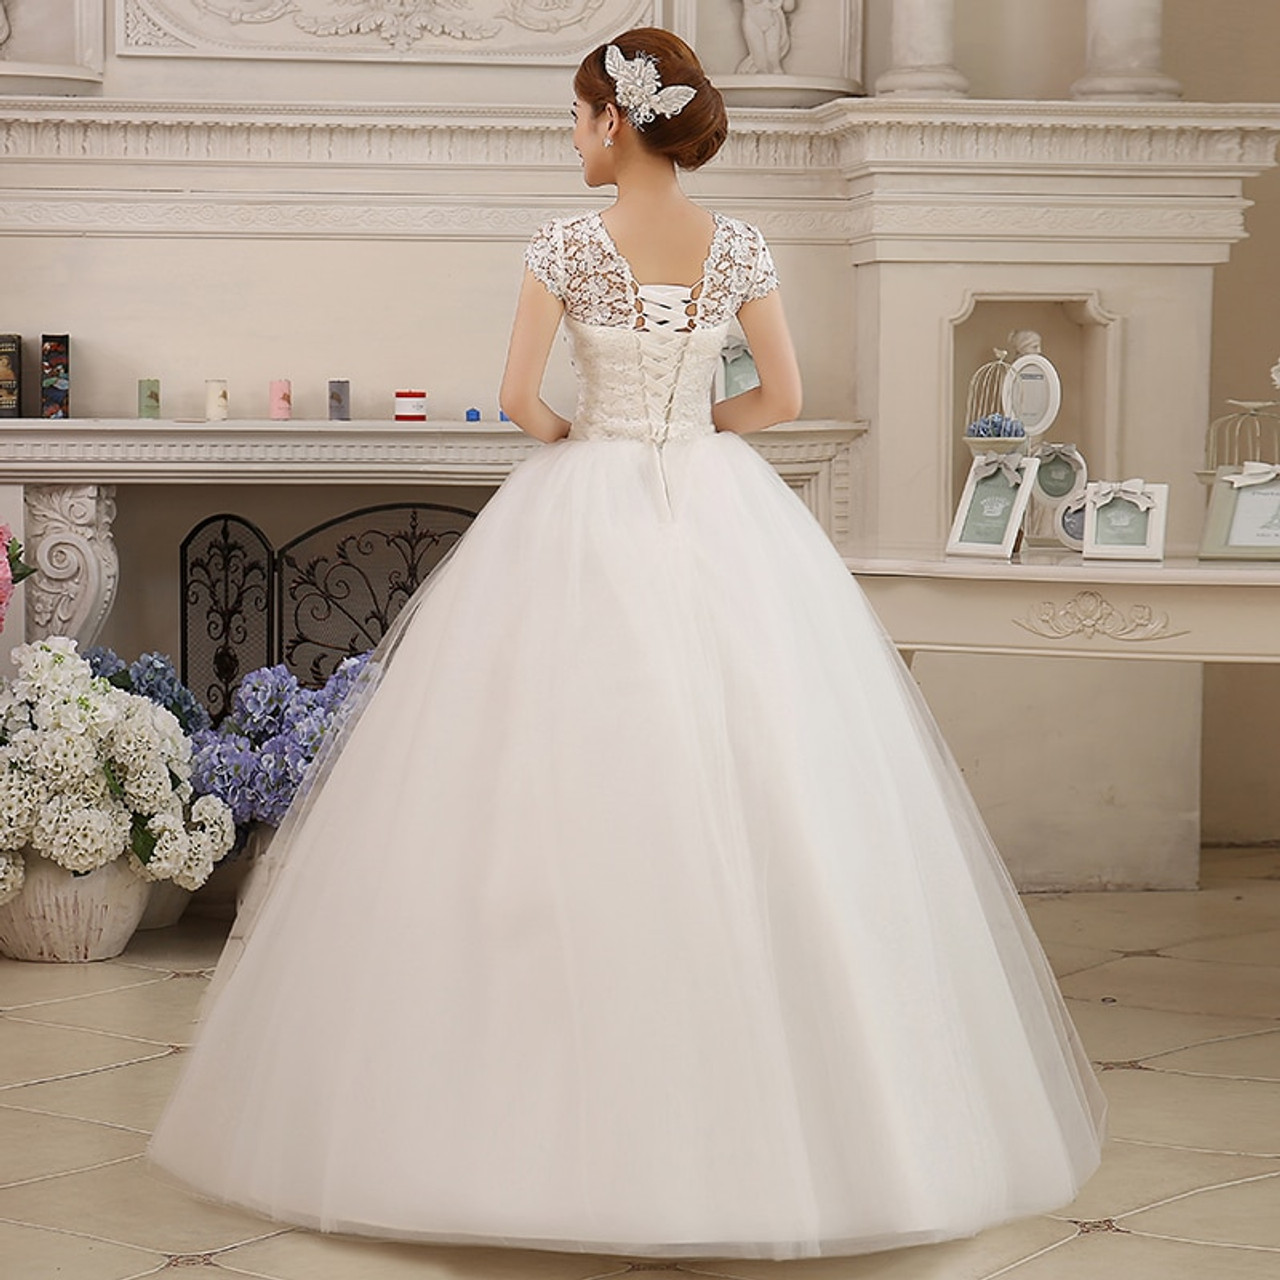 Fansmile Real Photo Cheap Short Sleeve Ball Wedding Dresses 2019 Lace Vintage Plus Size Bridal Gown Vestido De Noiva Fsm 038f Onshopdeals Com,Womens Wedding Guest Dresses Near Me